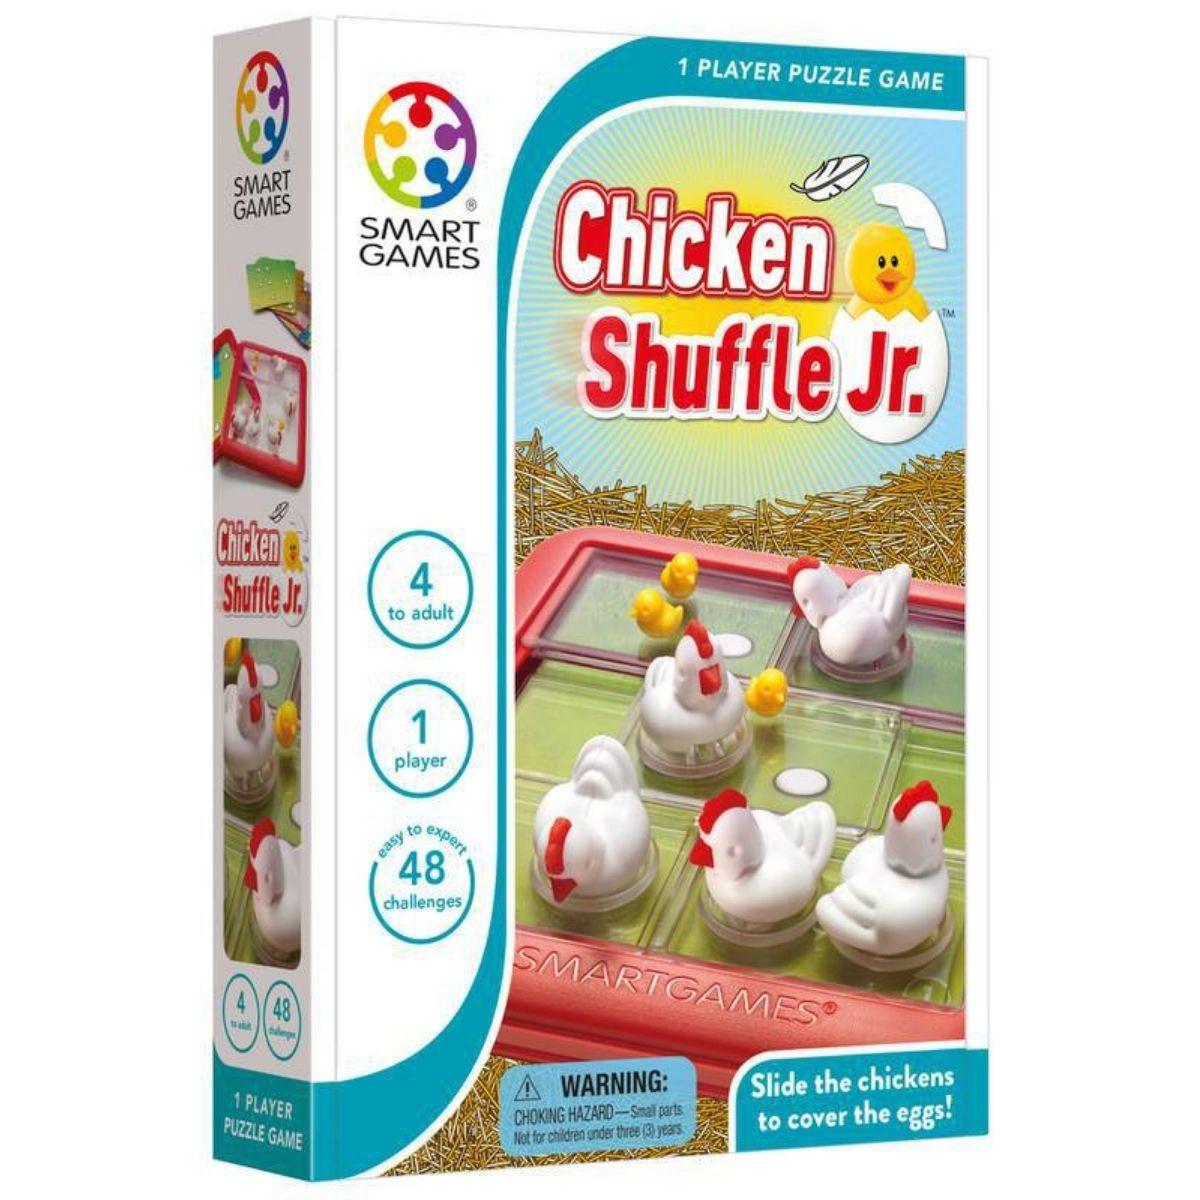 Jogo De Raciocínio Lógico Chicken Shuffle Jr Com 48 Desafios